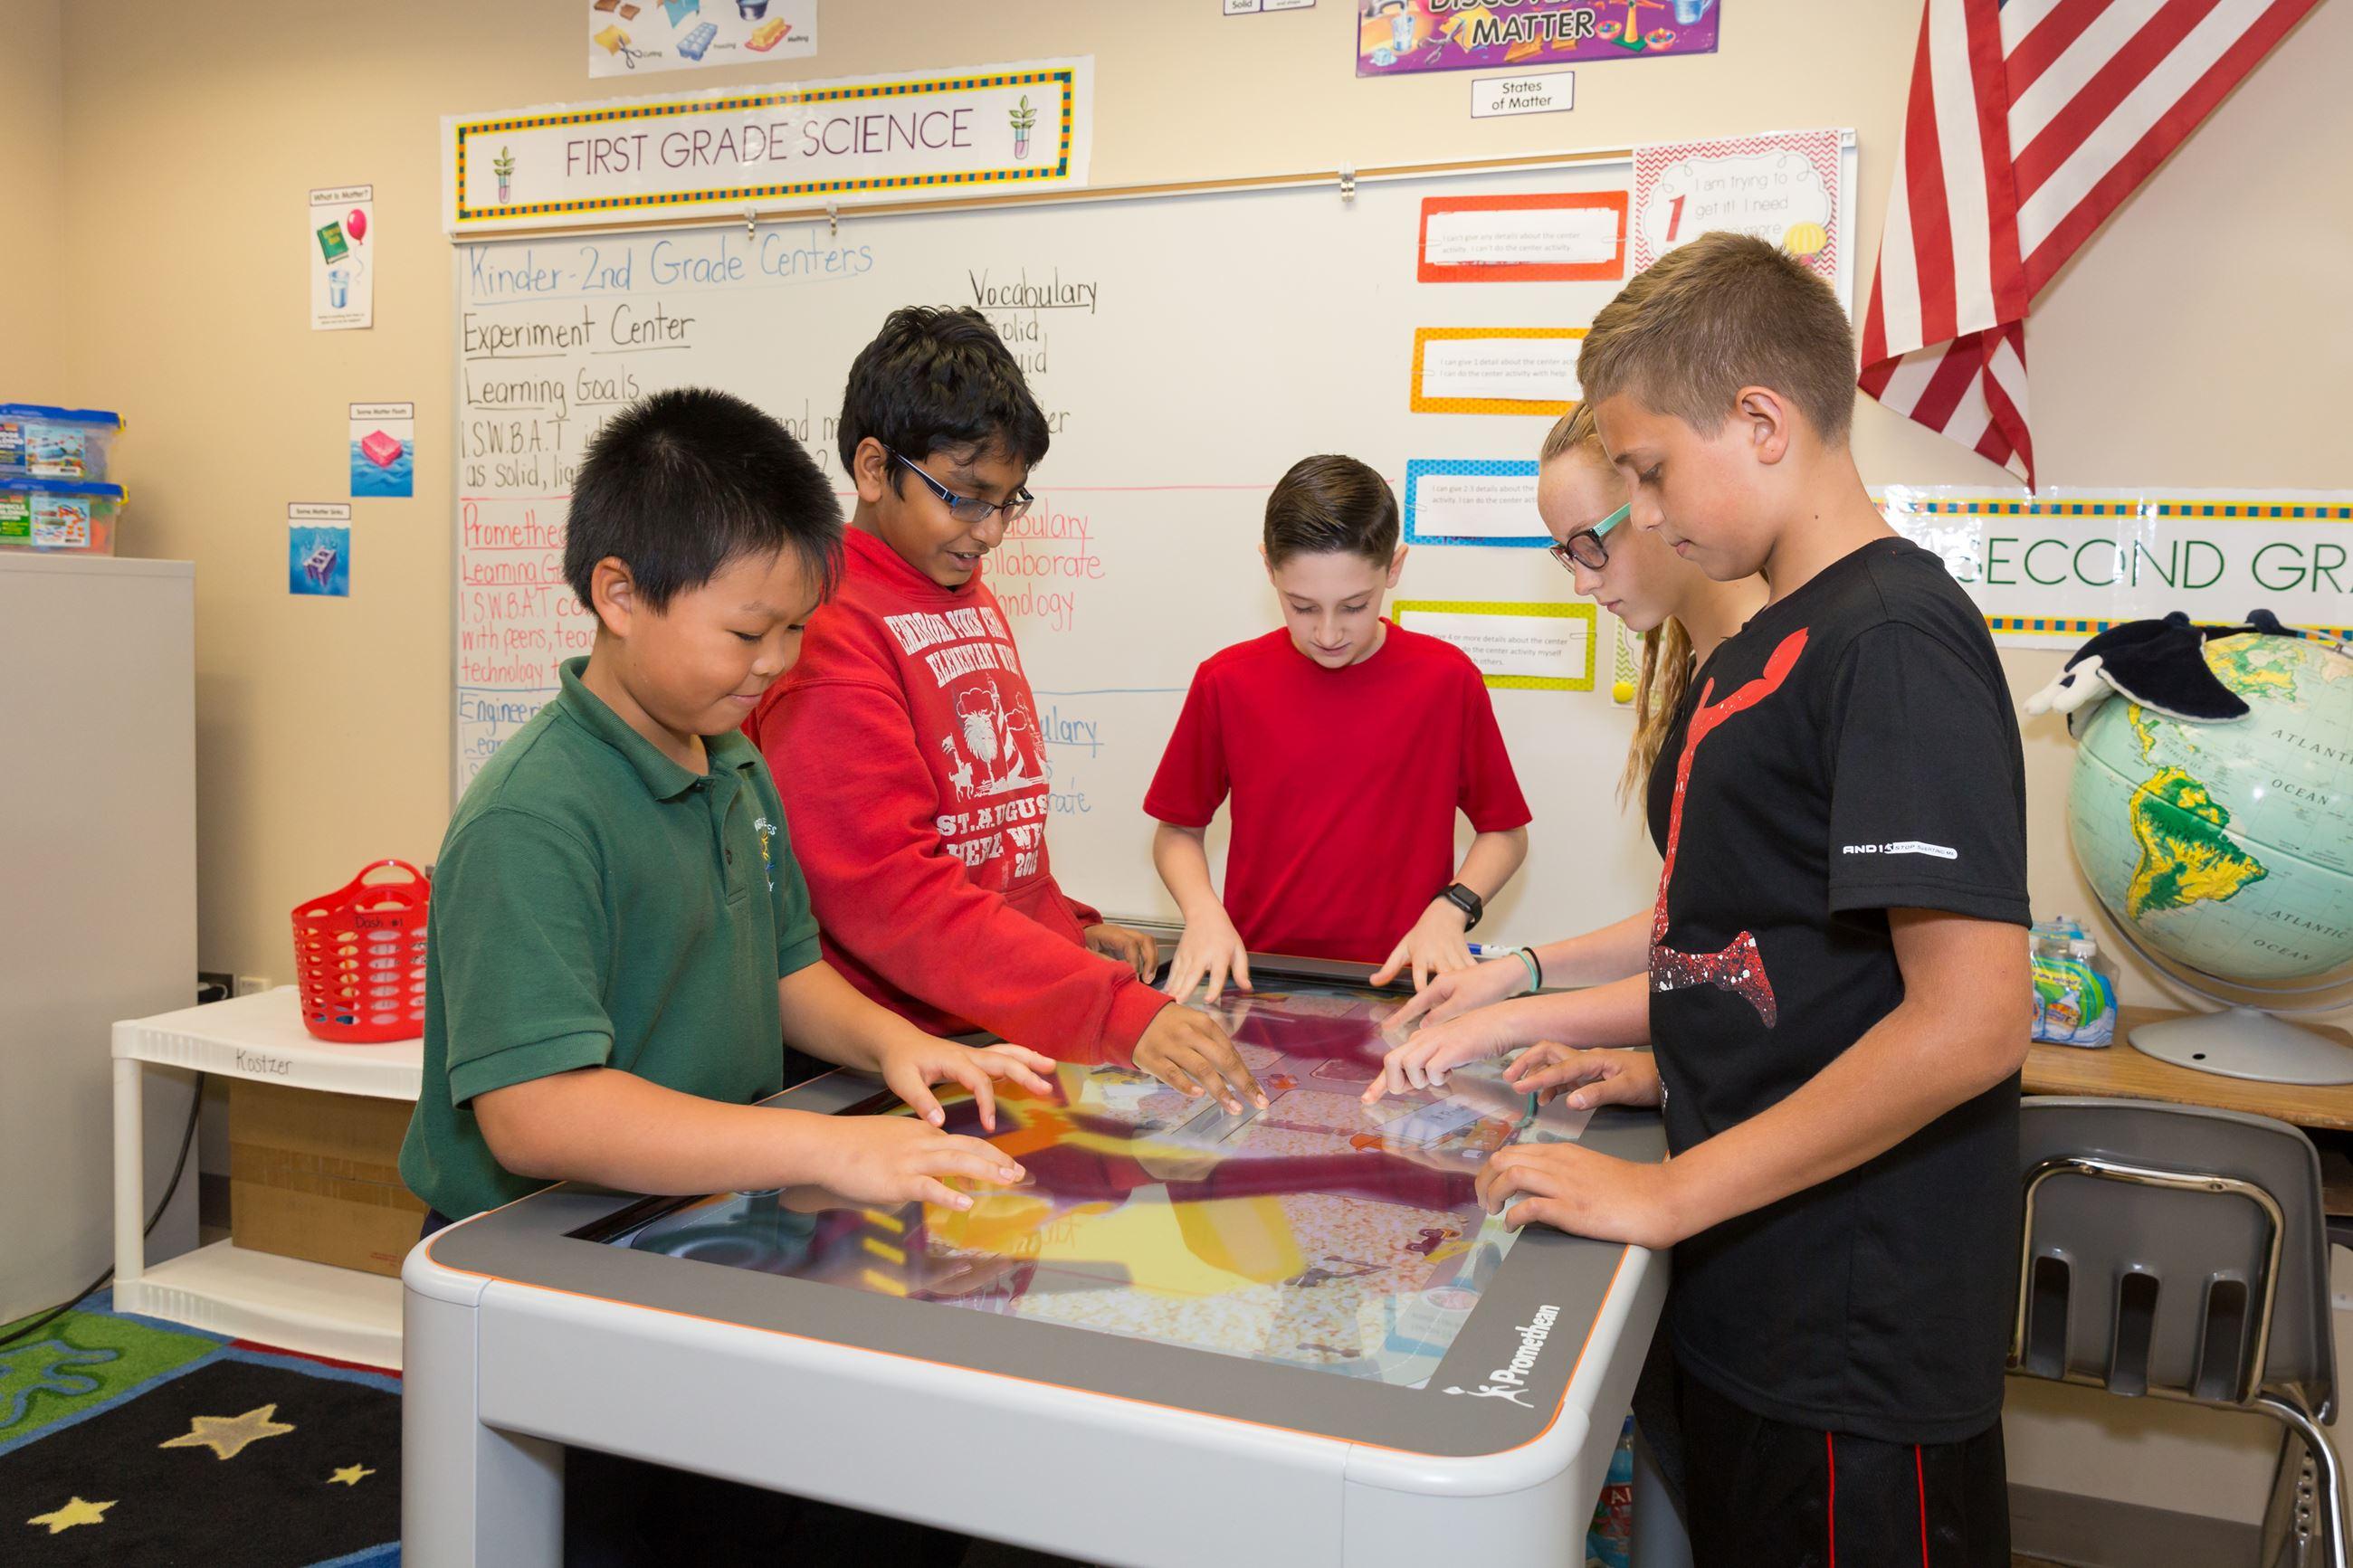 pembroke pines charter schools official website